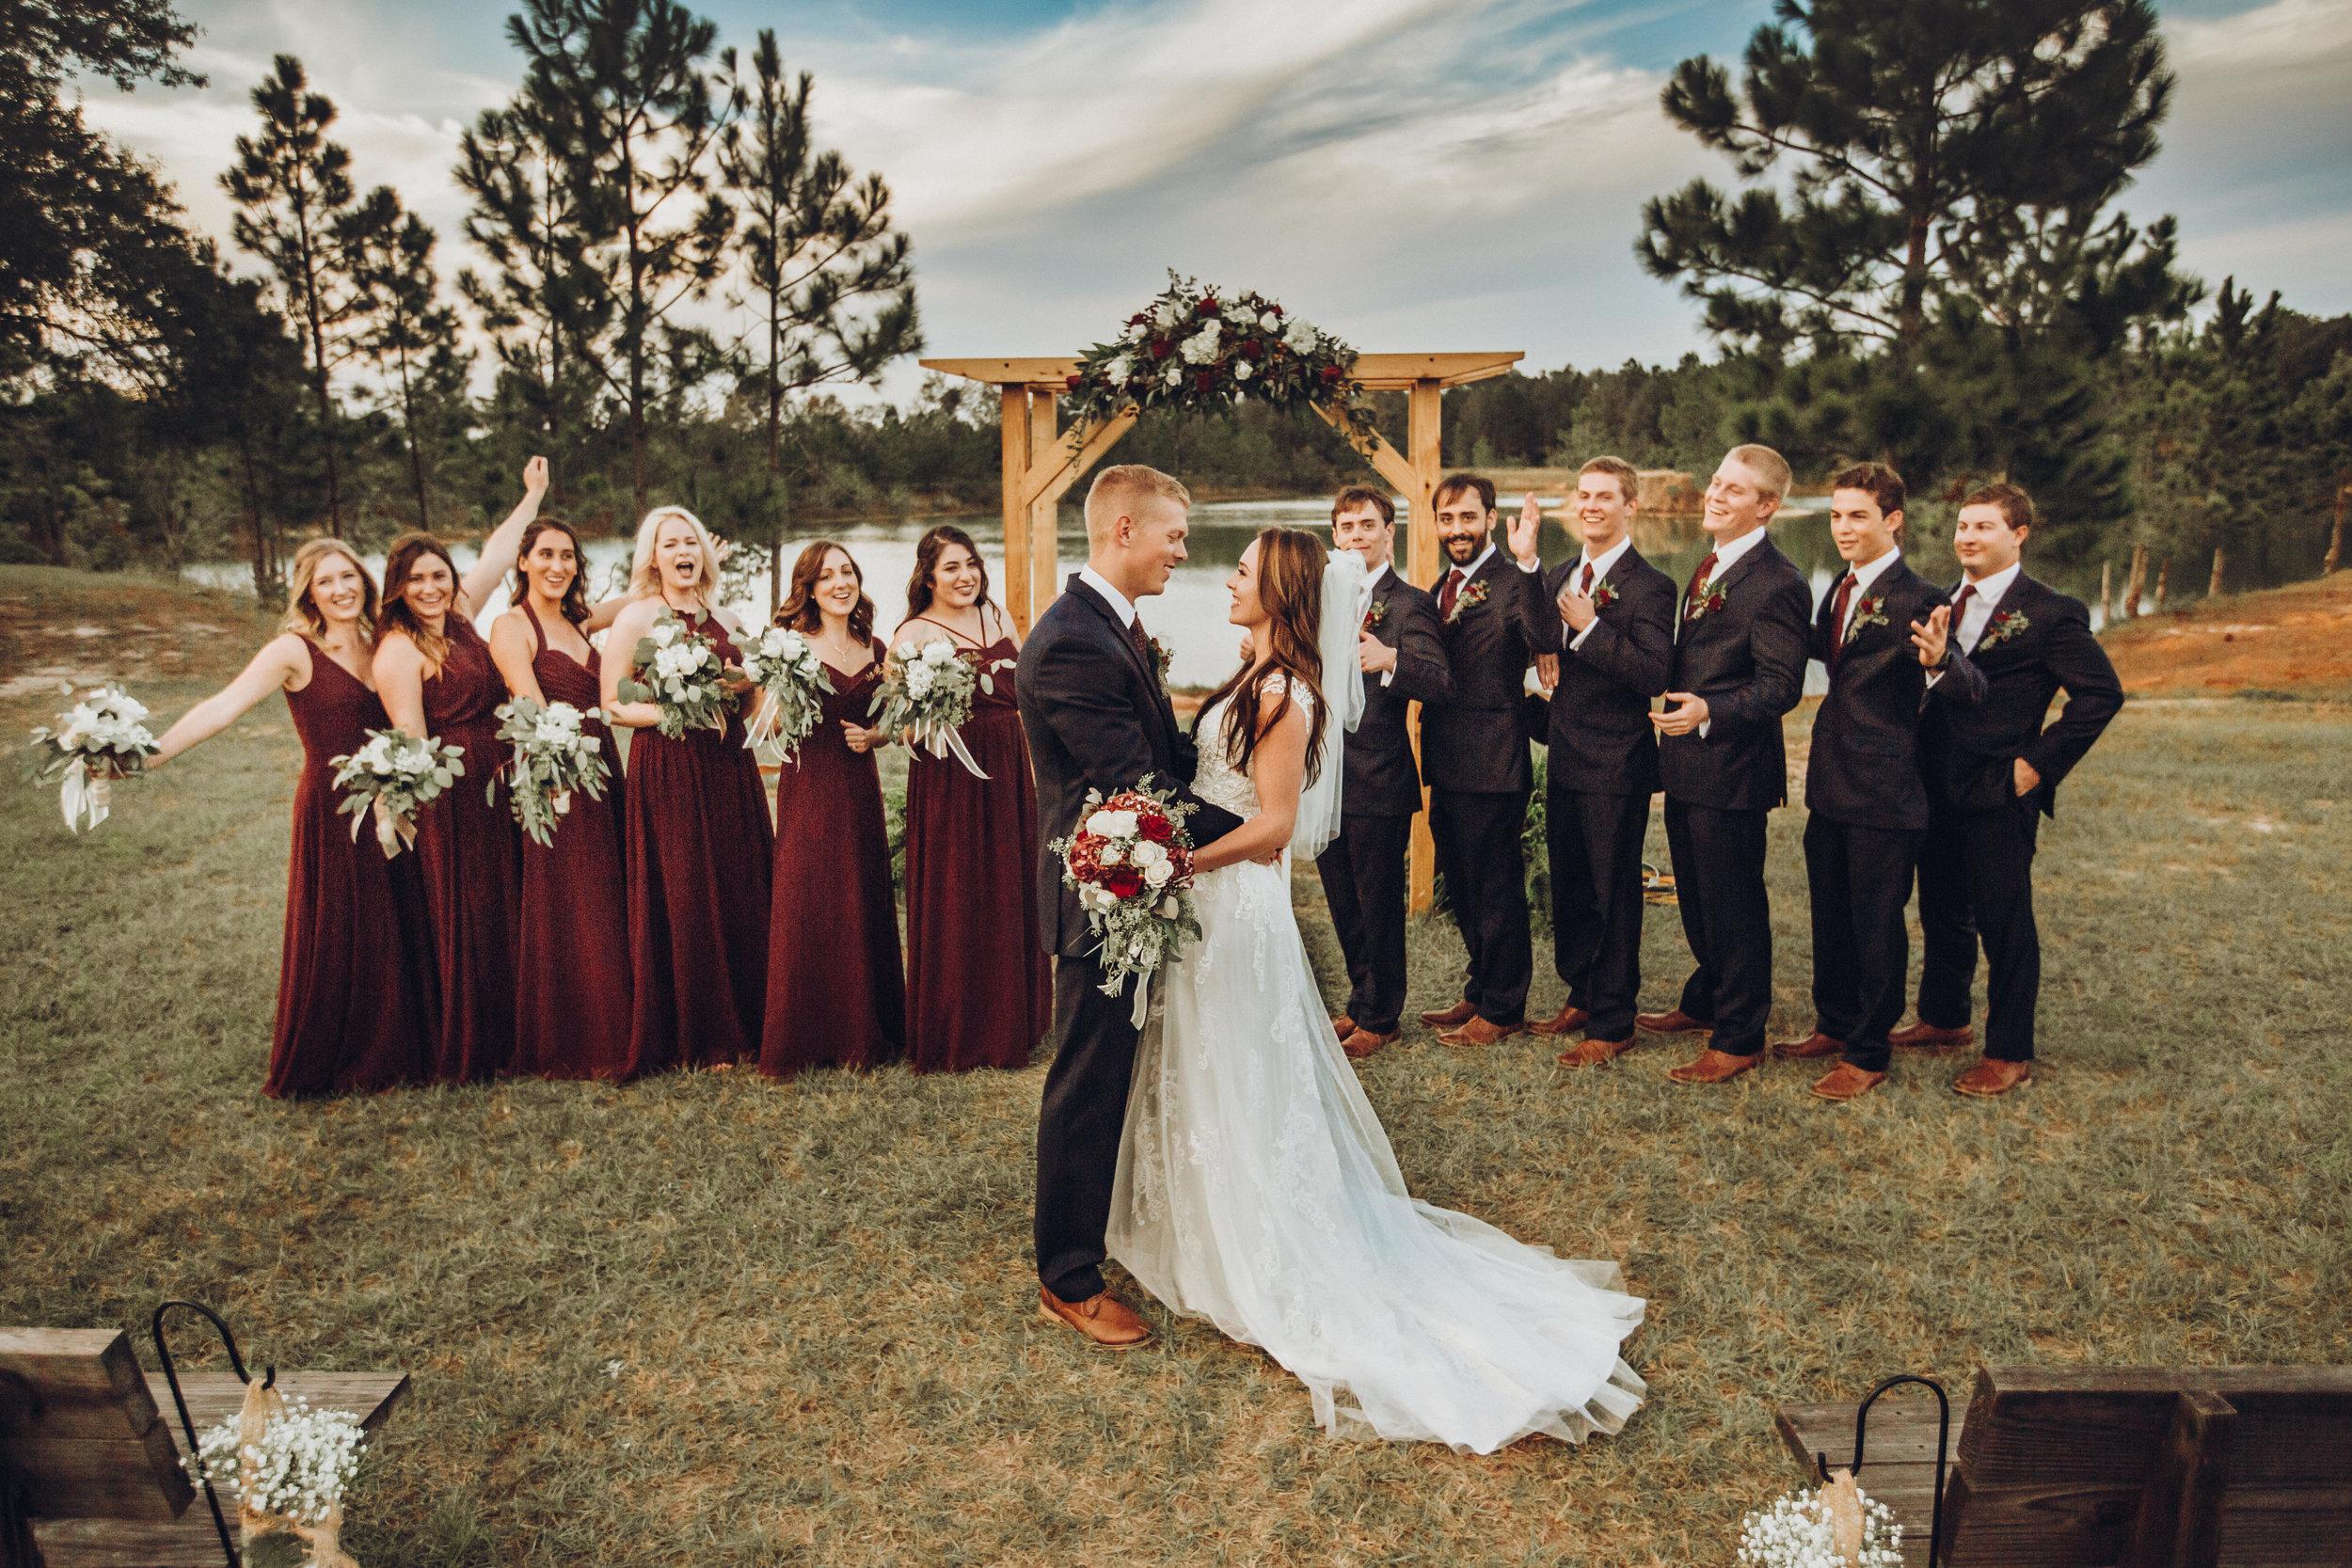 6. Bridal Party - Romantic Backyard Farm Wedding - Lauren+Daniel 003.jpg